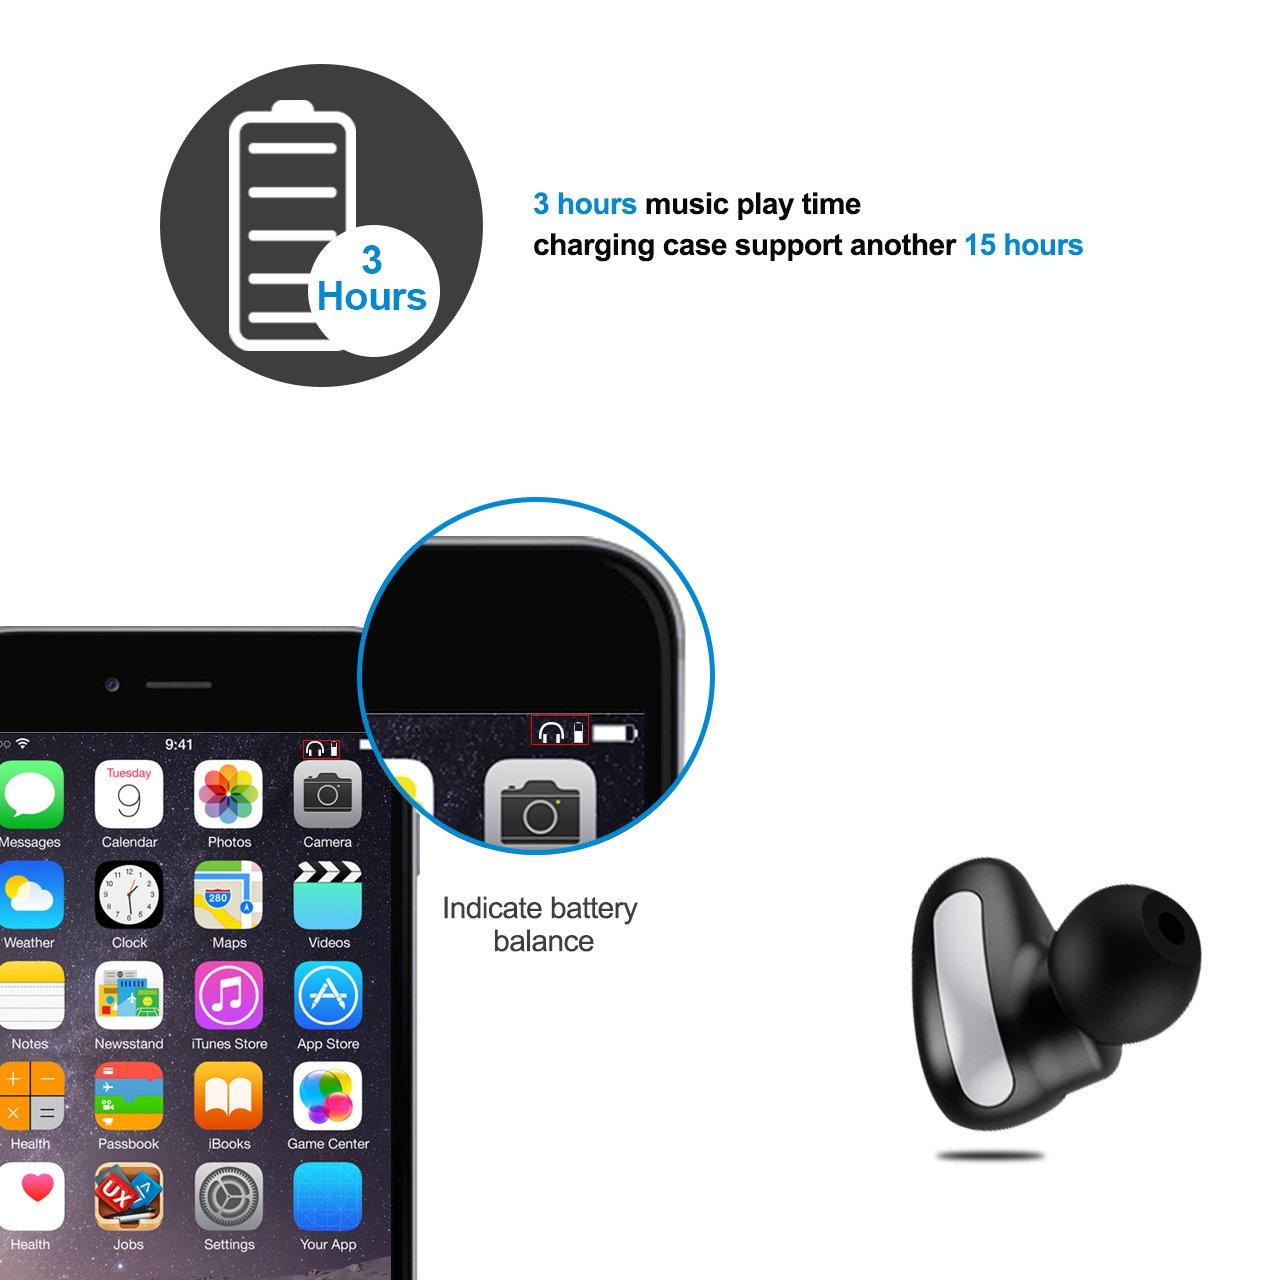 ALWUP Auriculares Bluetooth, V4.2 Verdaderos Auriculares Estereofónicos Inalámbricos, IPX5 Deportivos Inalámbricos a Prueba de Sudor, Dual Mini Auriculares ...